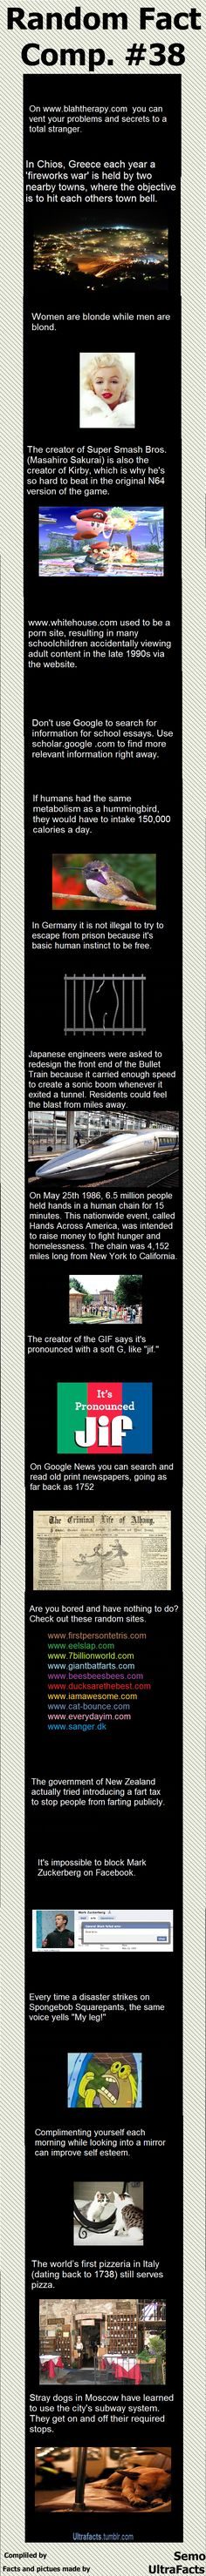 Random Fact Comp. 38